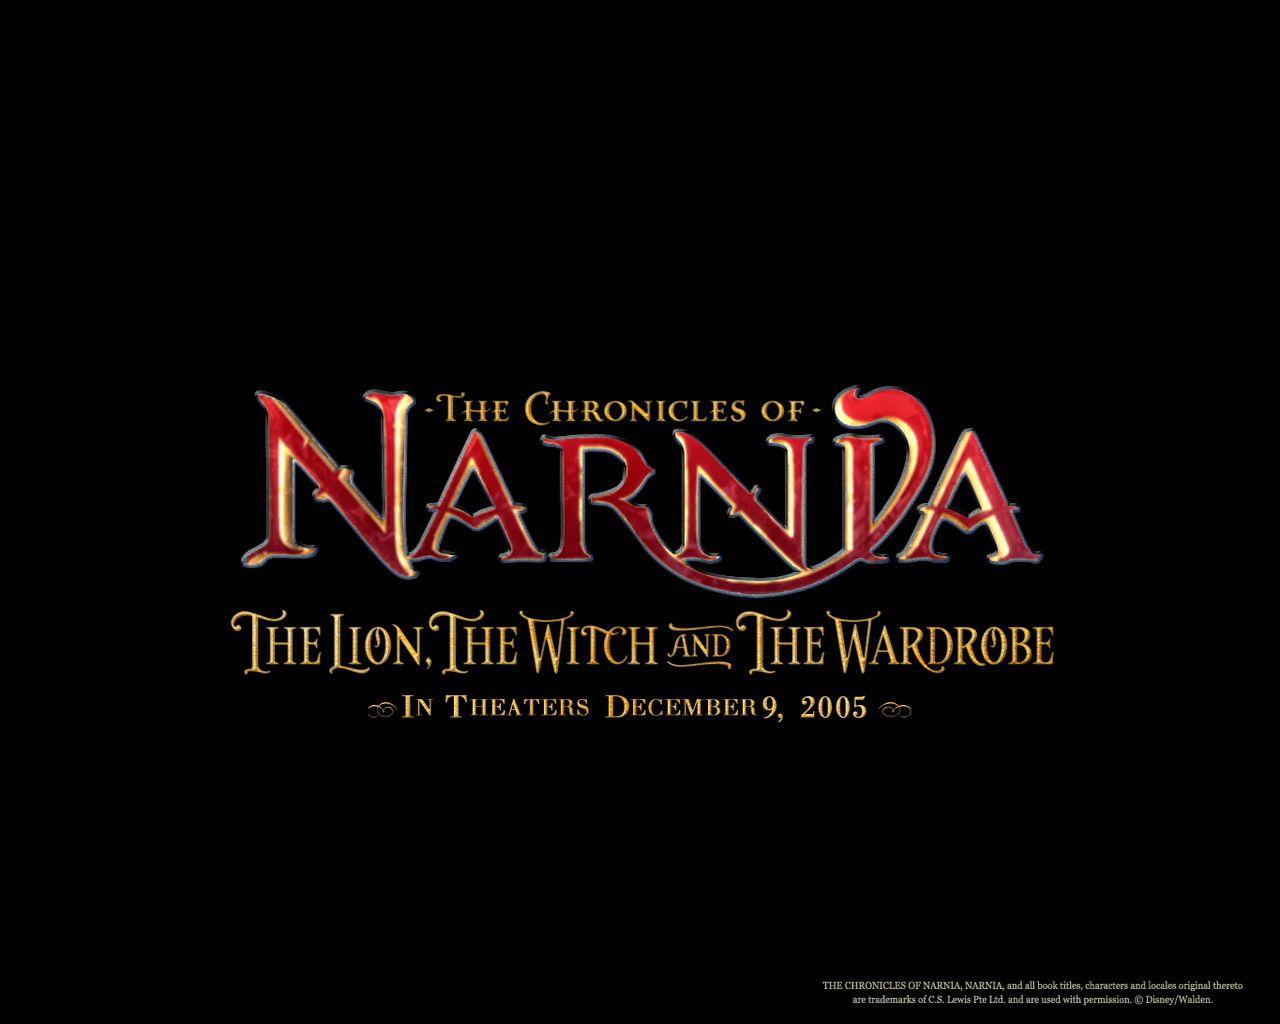 Narnia black Papel de parede computador, Papeis de